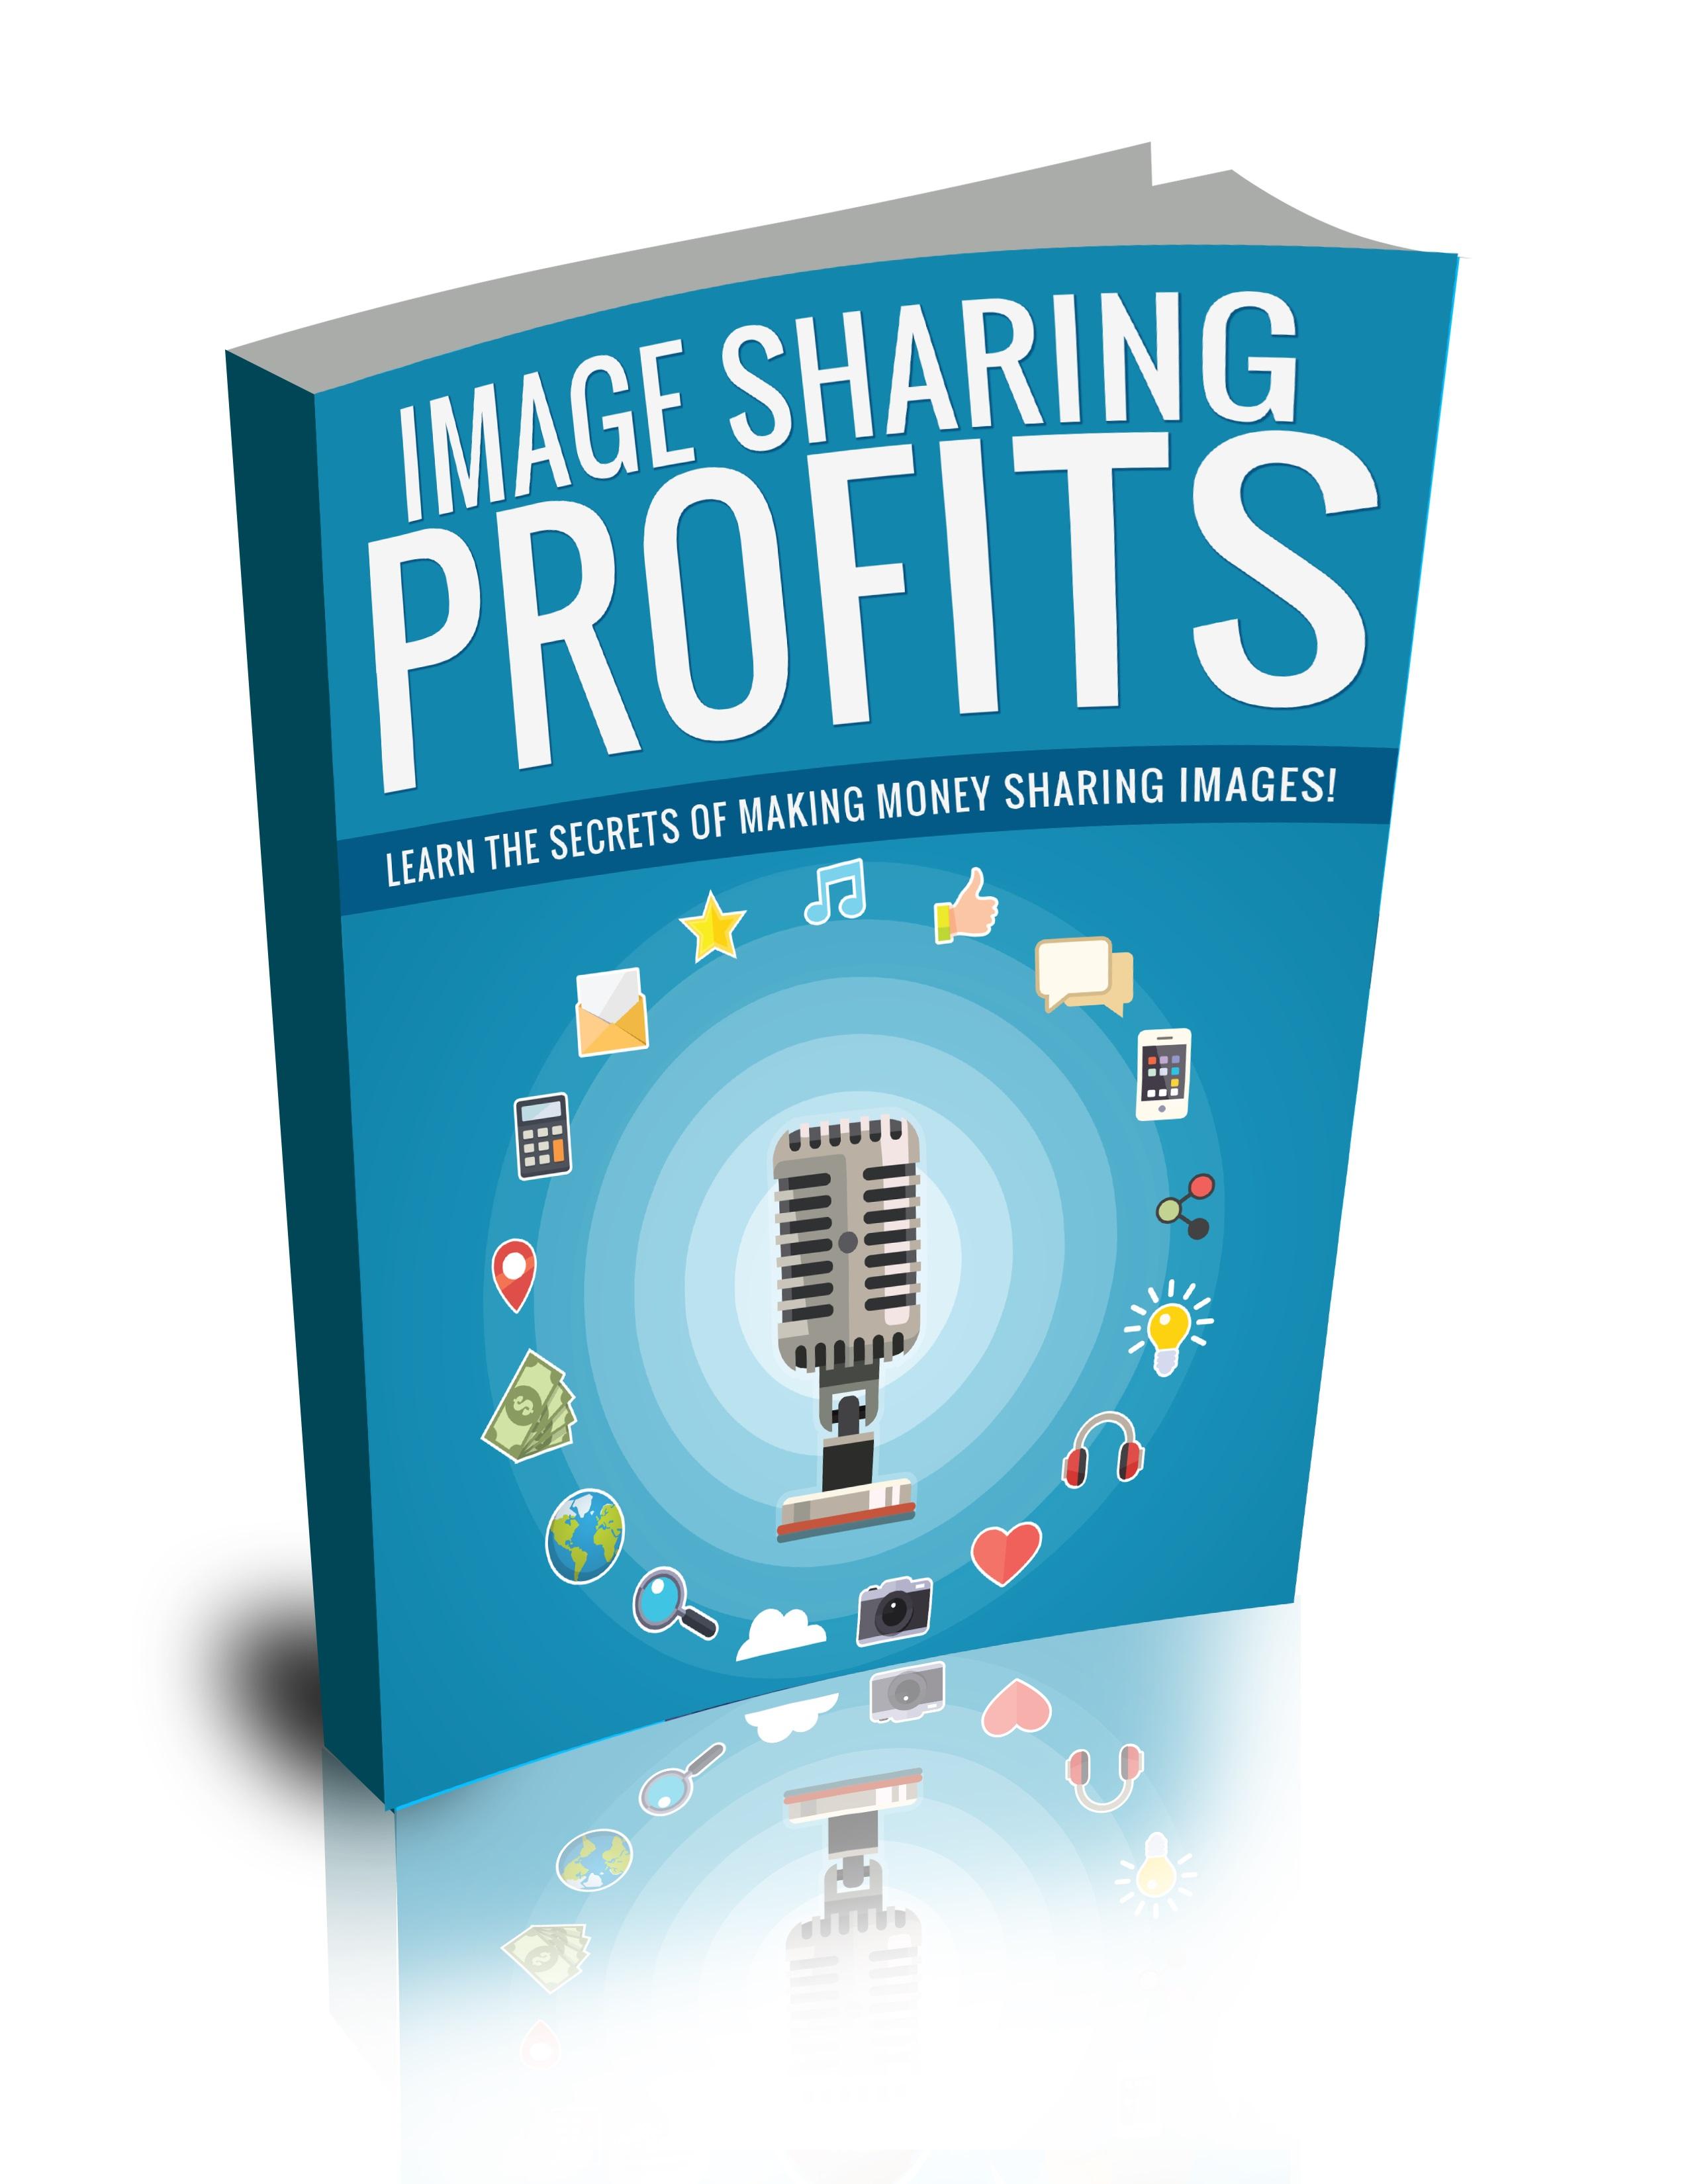 Image Sharing Profits Package